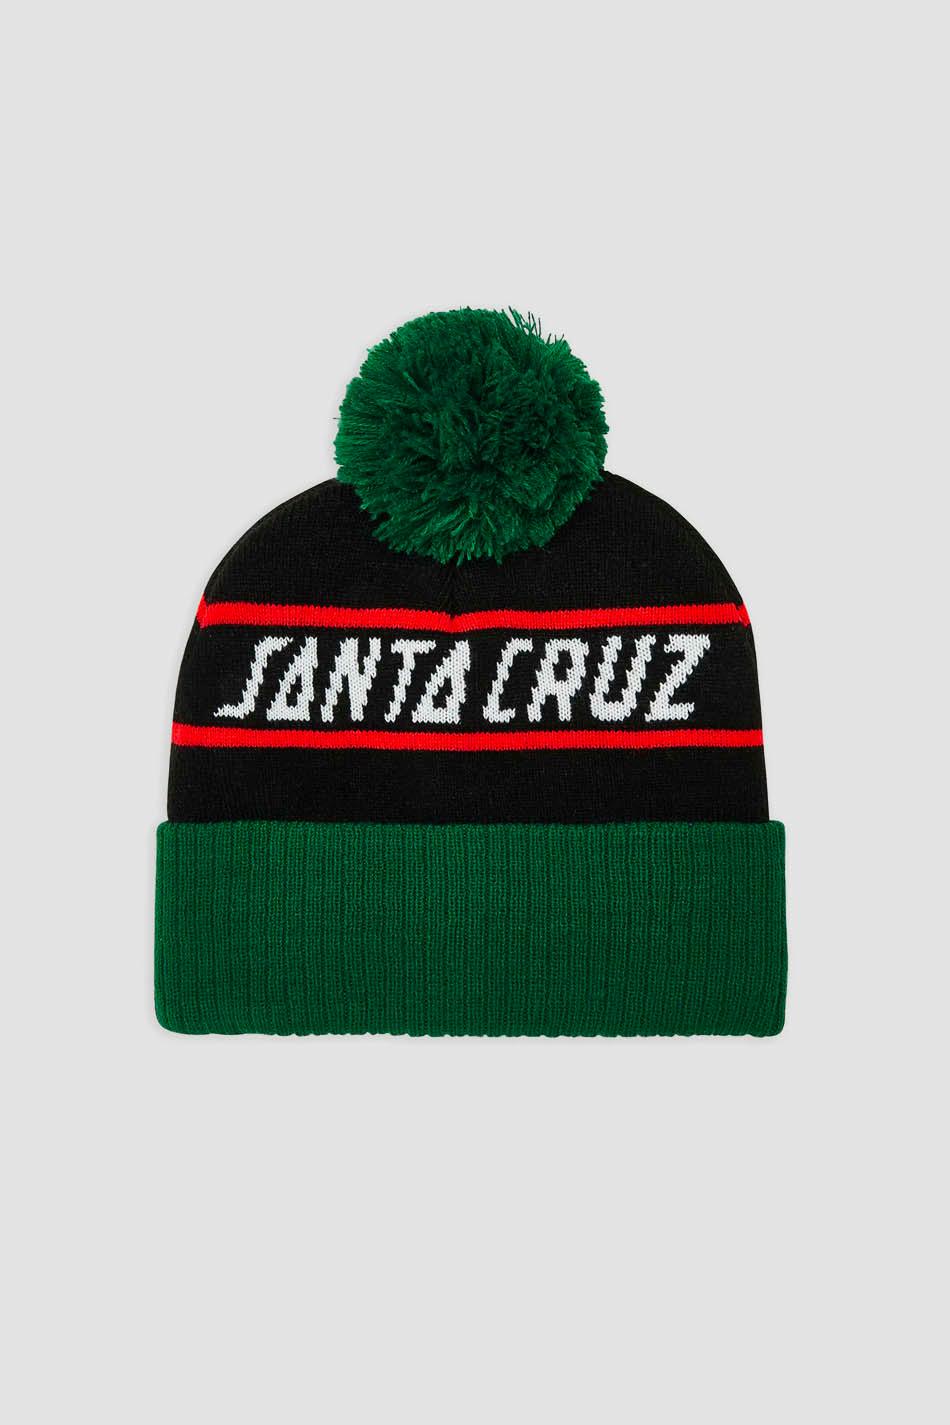 Santa Cruz immer grüne Mütze